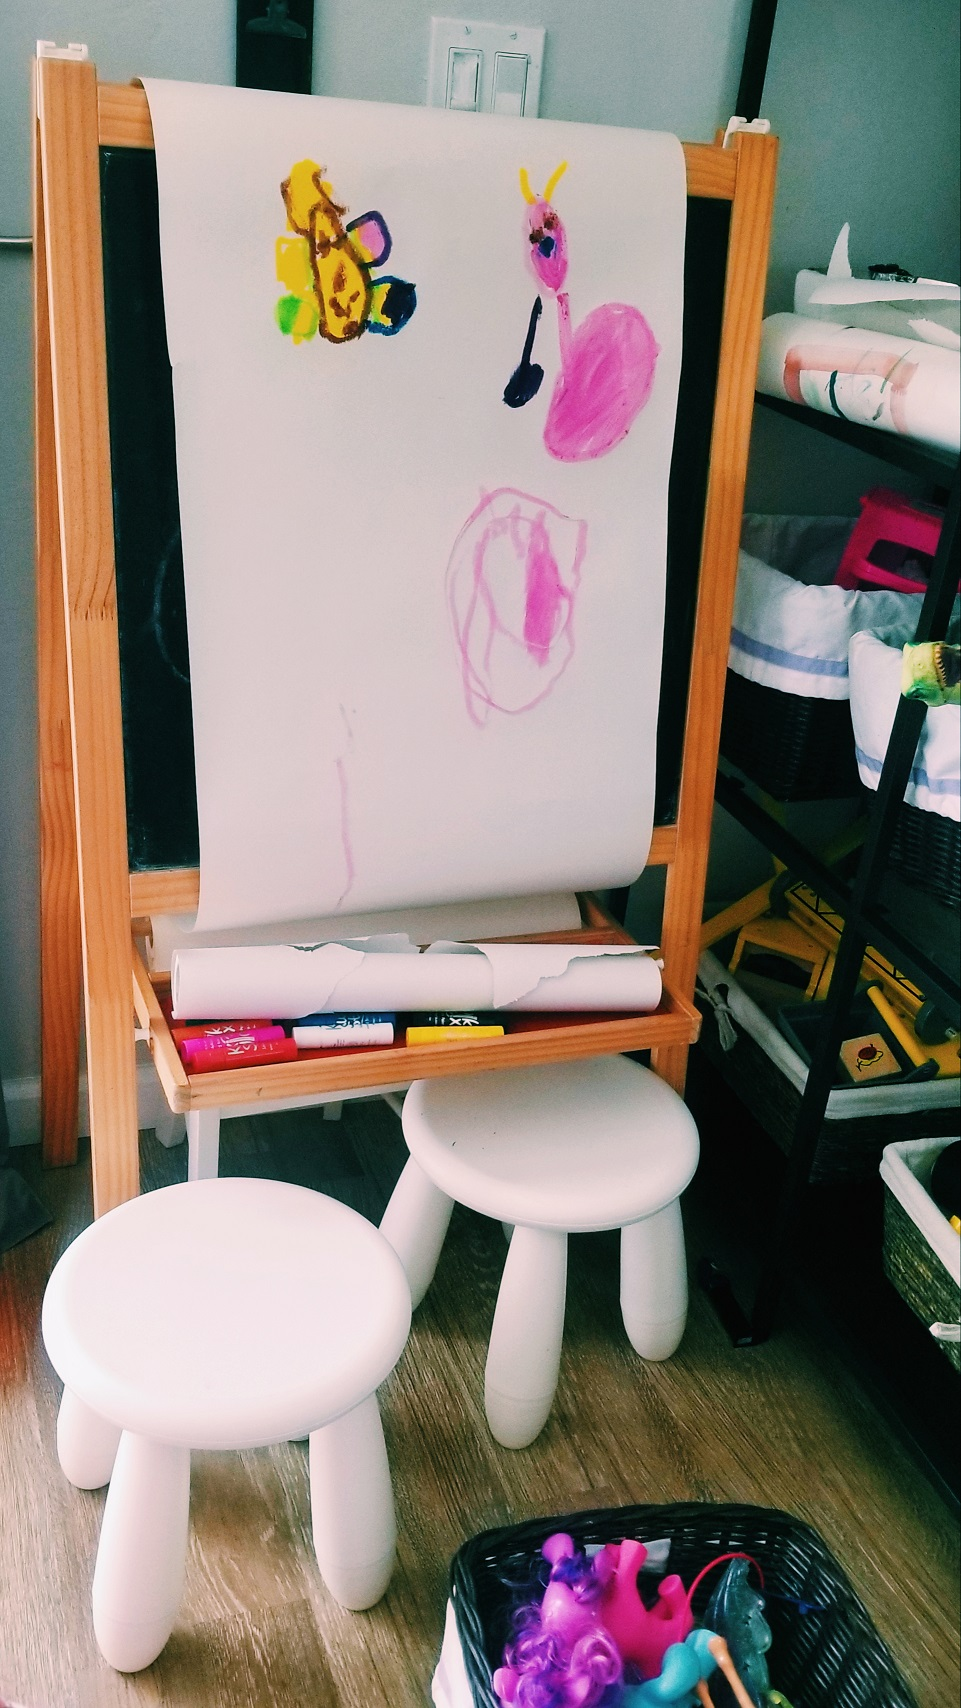 easel for displaying kid artwork